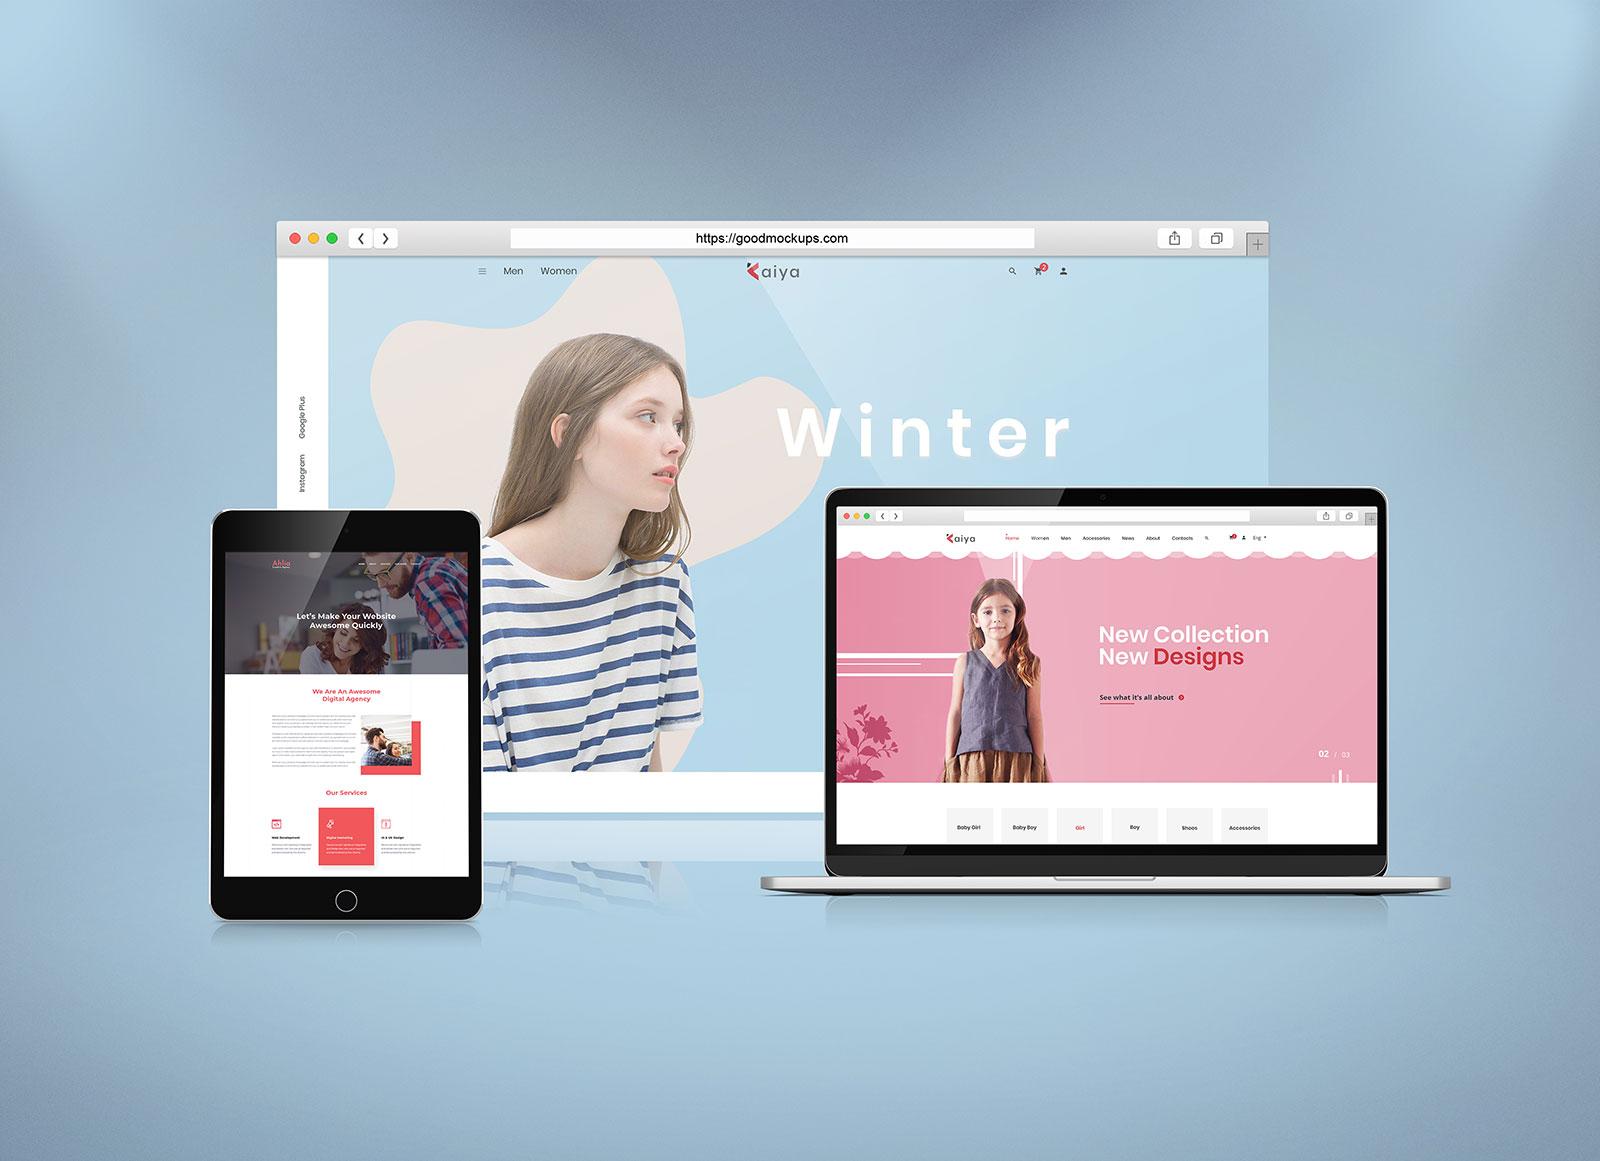 Free-Responsive-Website-Showcase-Mockup-PSD